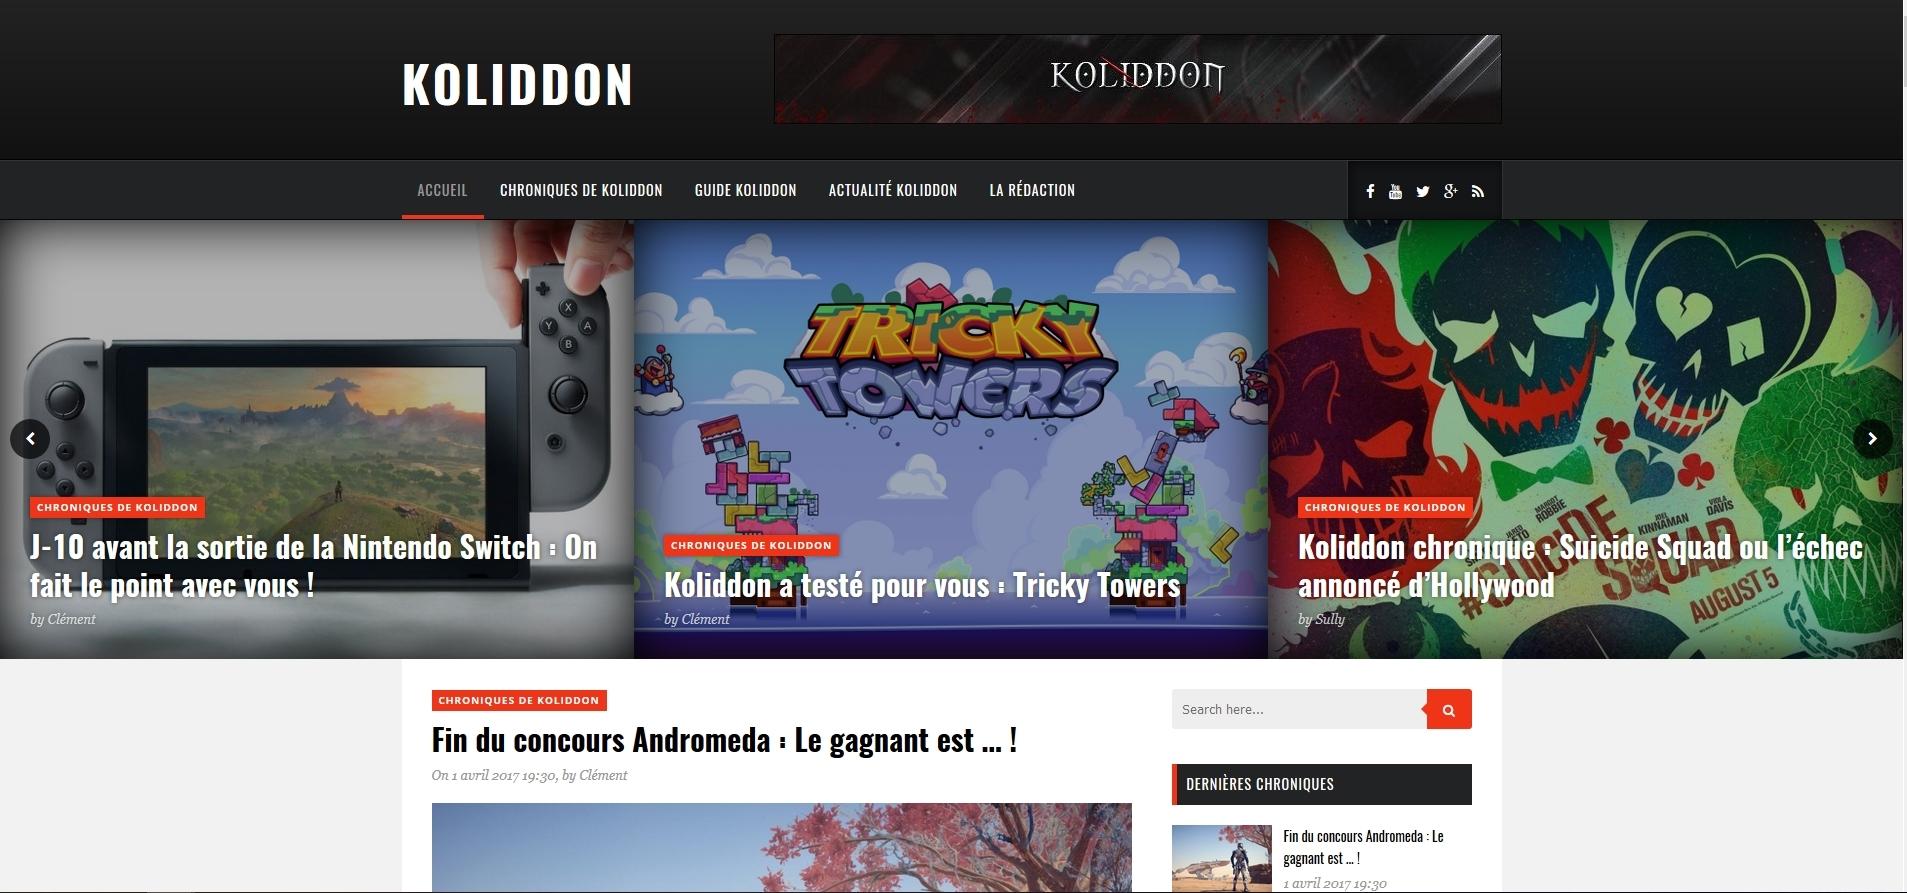 koliddon.com